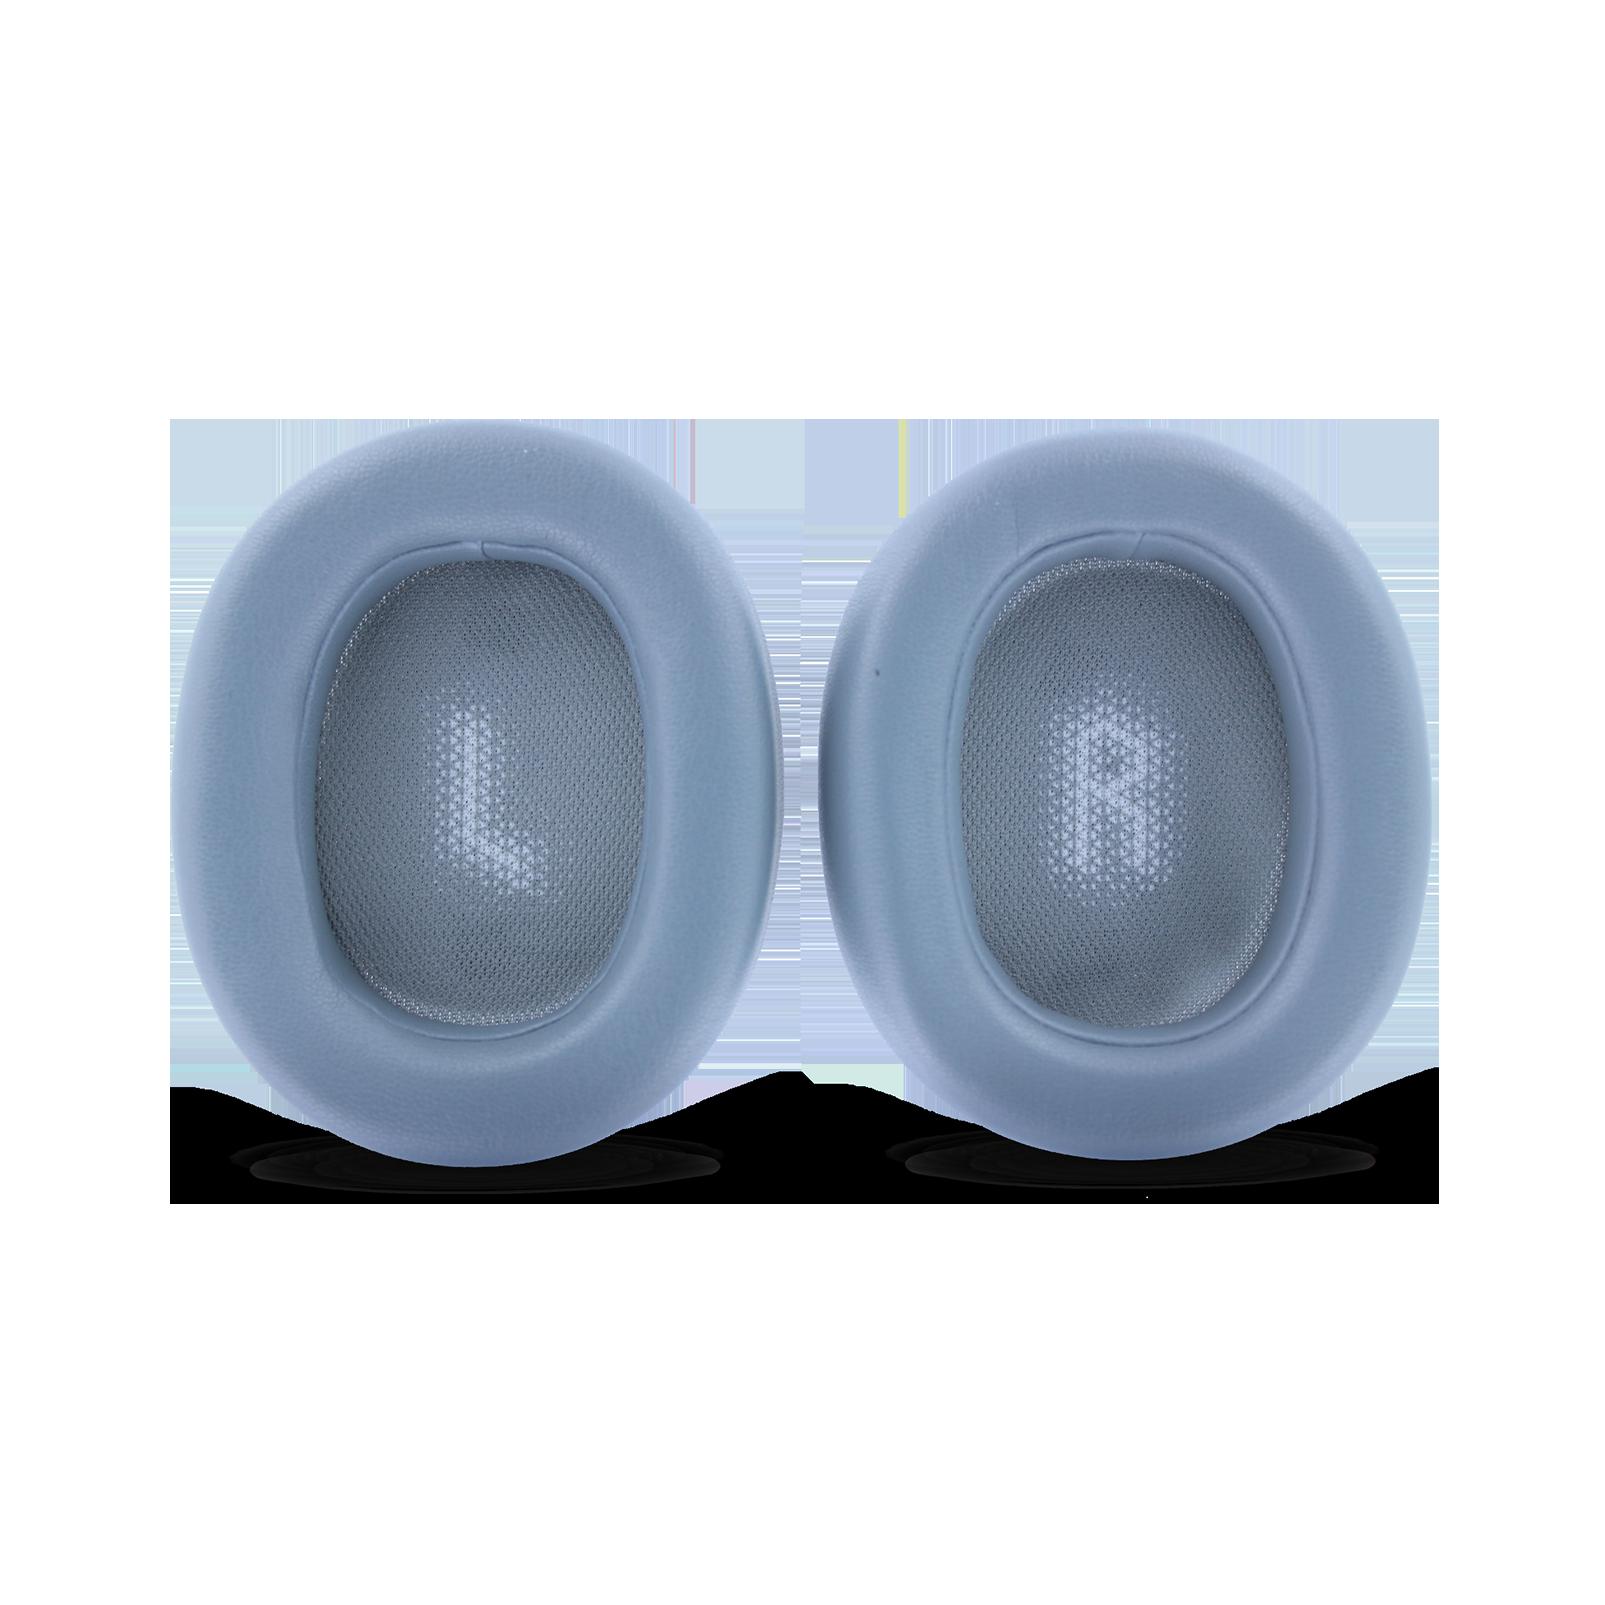 JBL Ear pads for V750NC - Silver - Ear pad set (L+R) - Hero